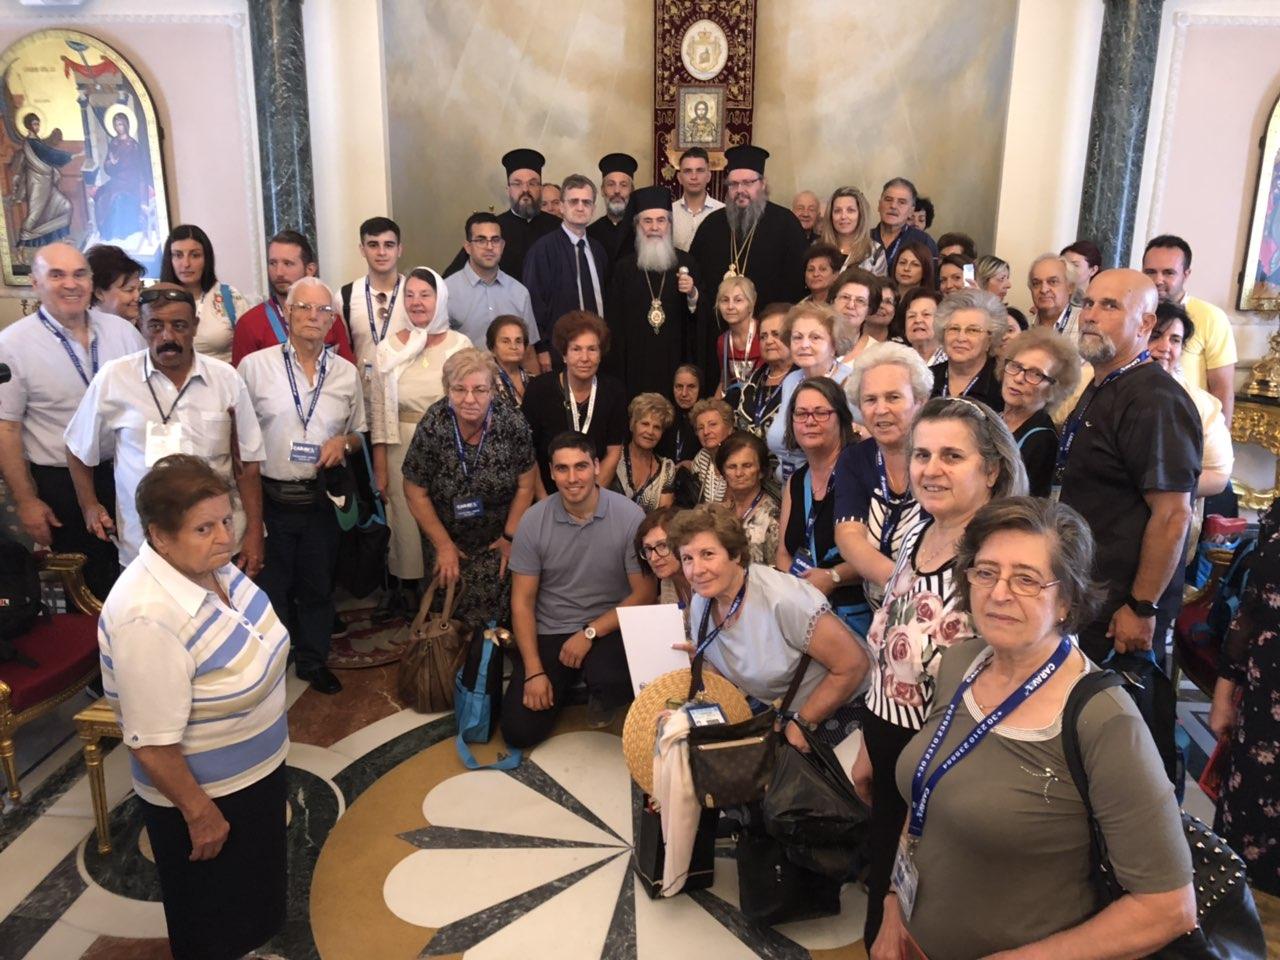 ierosolyma2019 5 - Λαρισαίοι Προσκυνητές Στην Αγία Γη Των Ιεροσολύμων (φωτο)